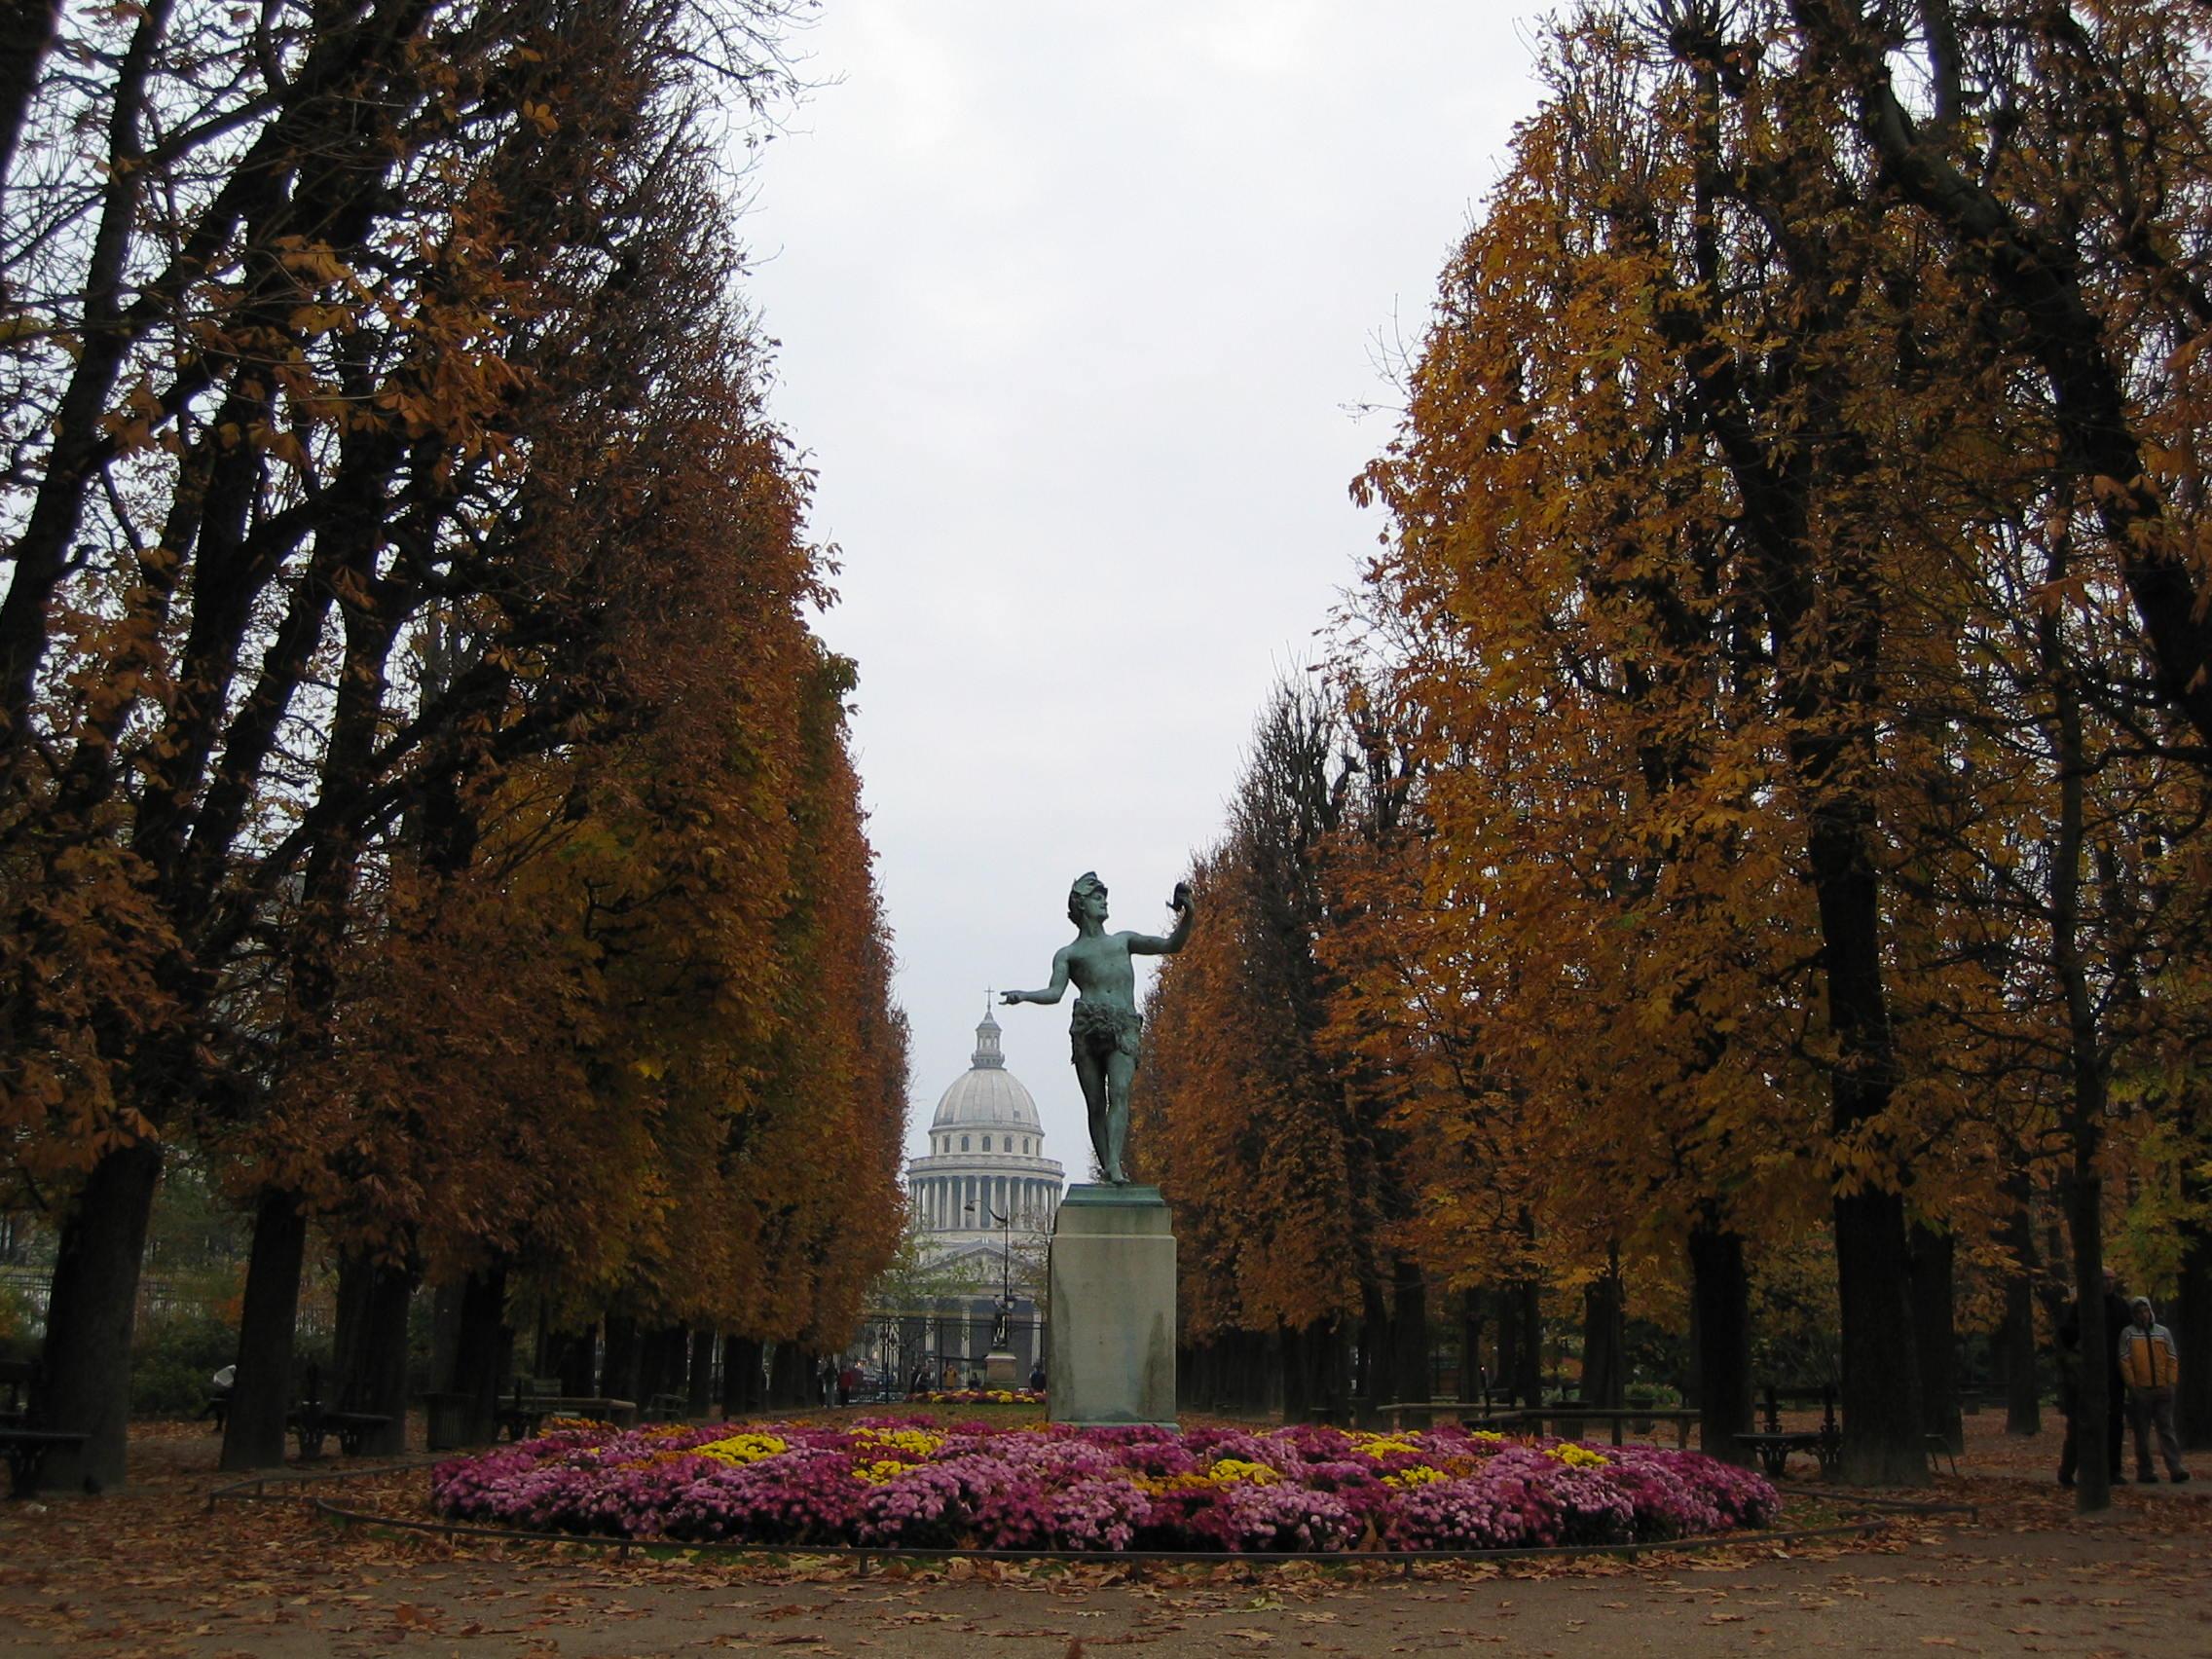 File:une Allée Au Jardin Du Luxembourg.jpg - Wikipedia avec Allee De Jardin